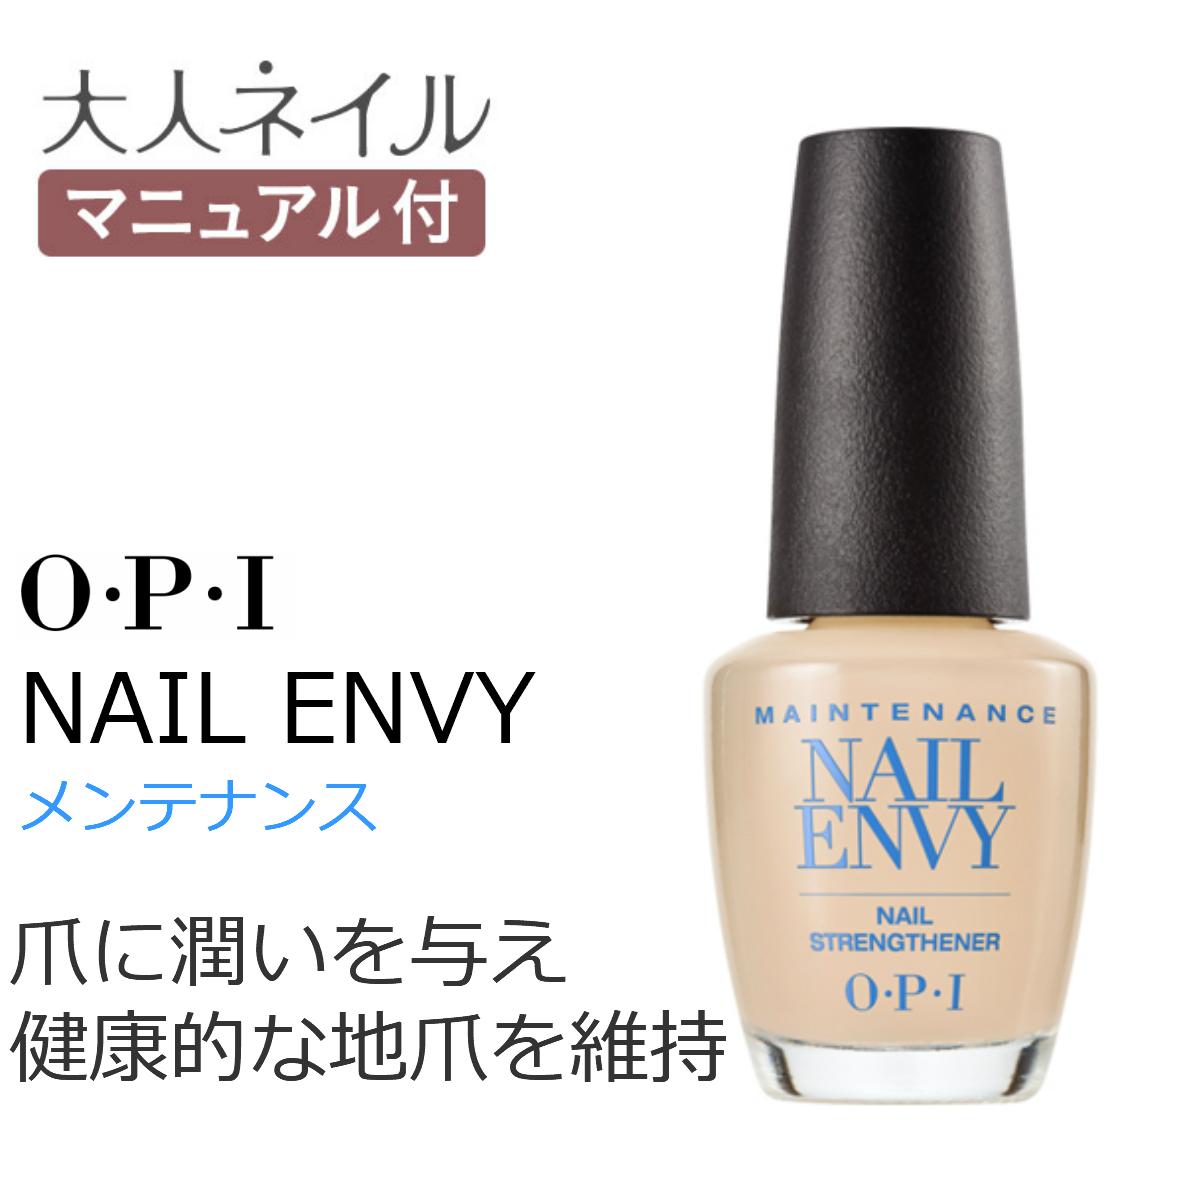 OPI(オーピーアイ) ネイルエンビーメンテナンス(爪強化剤)15ml